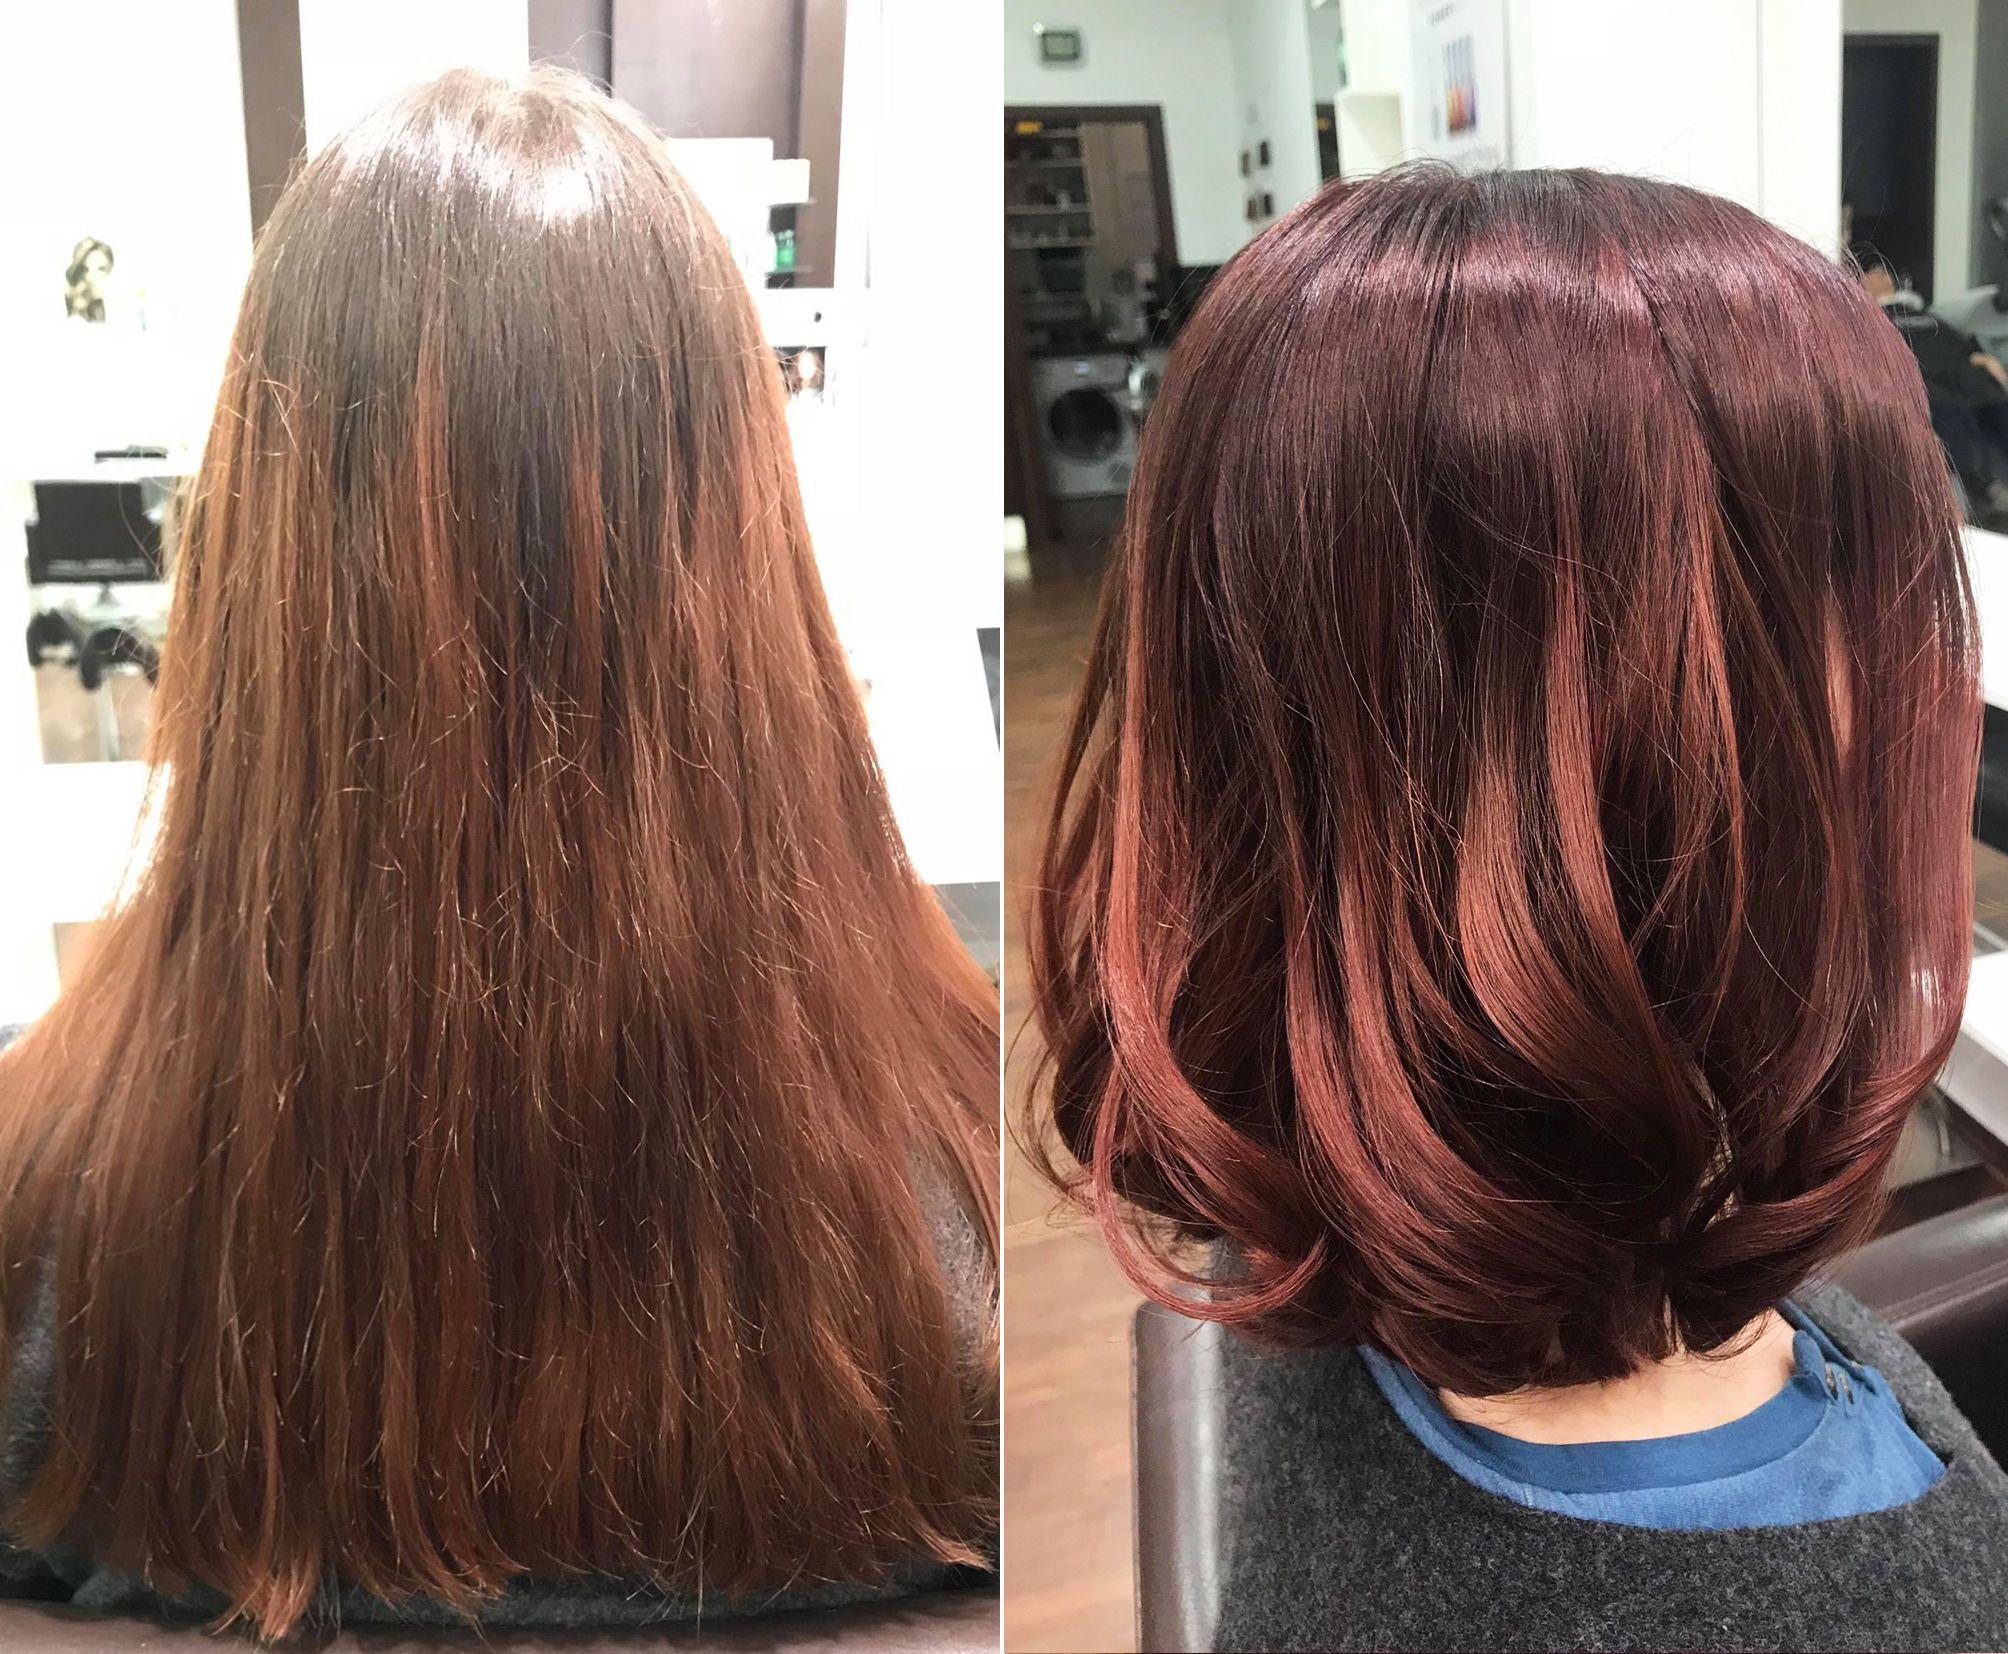 Longbob Haarschnitt Frisuren Vorher Nachher D Machts Lounge